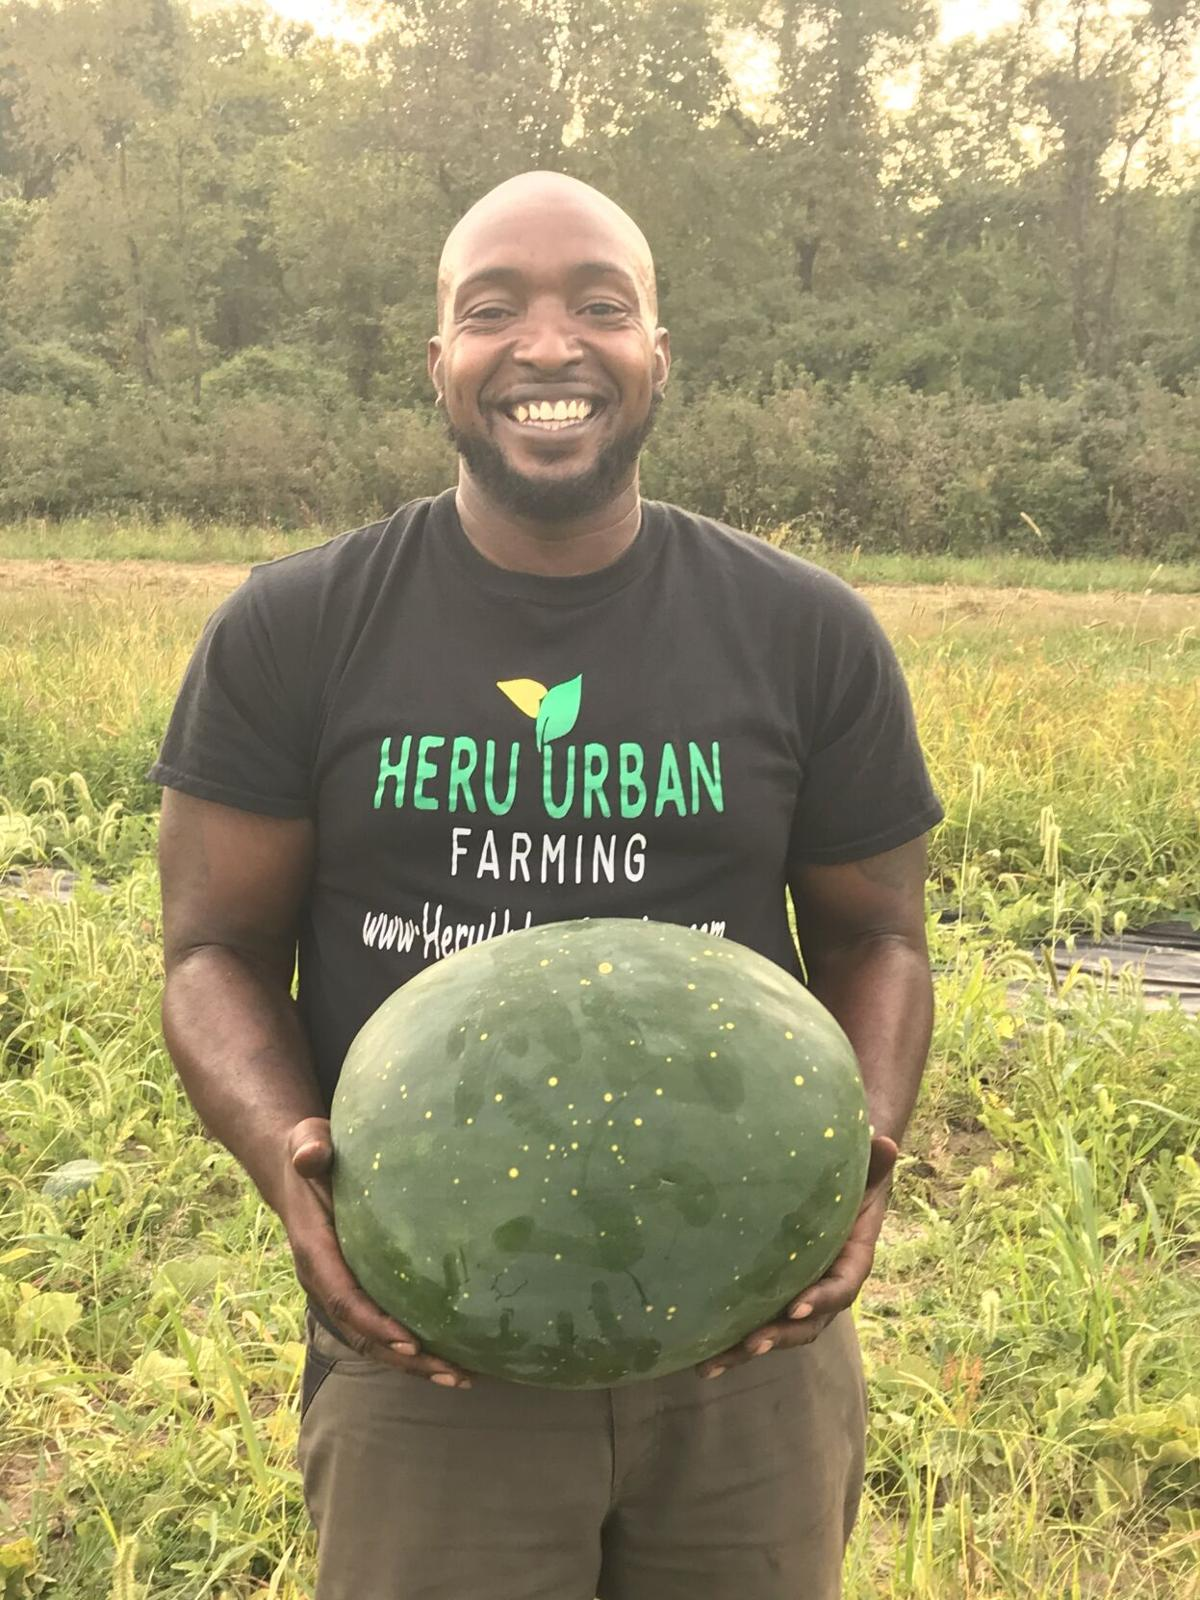 Heru Urban Farming watermelon